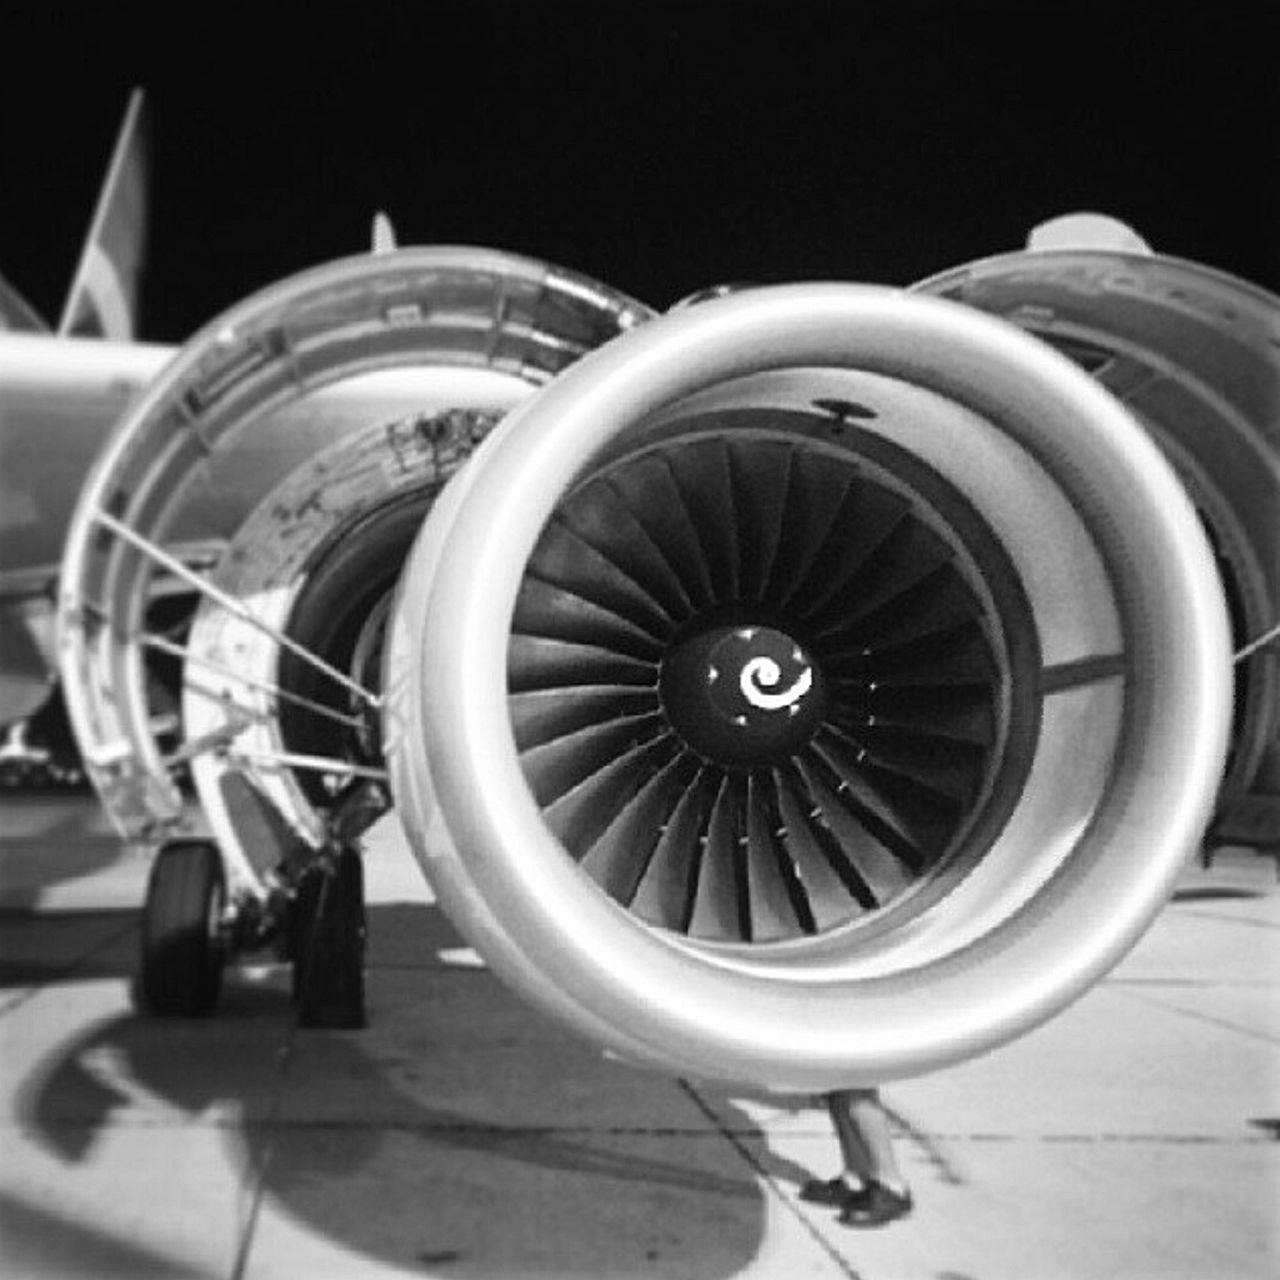 Aircraft engine maintenance Transportation Airplane Technology Aircraft Photography Aircraft AirPlane ✈ AircraftMaintenance